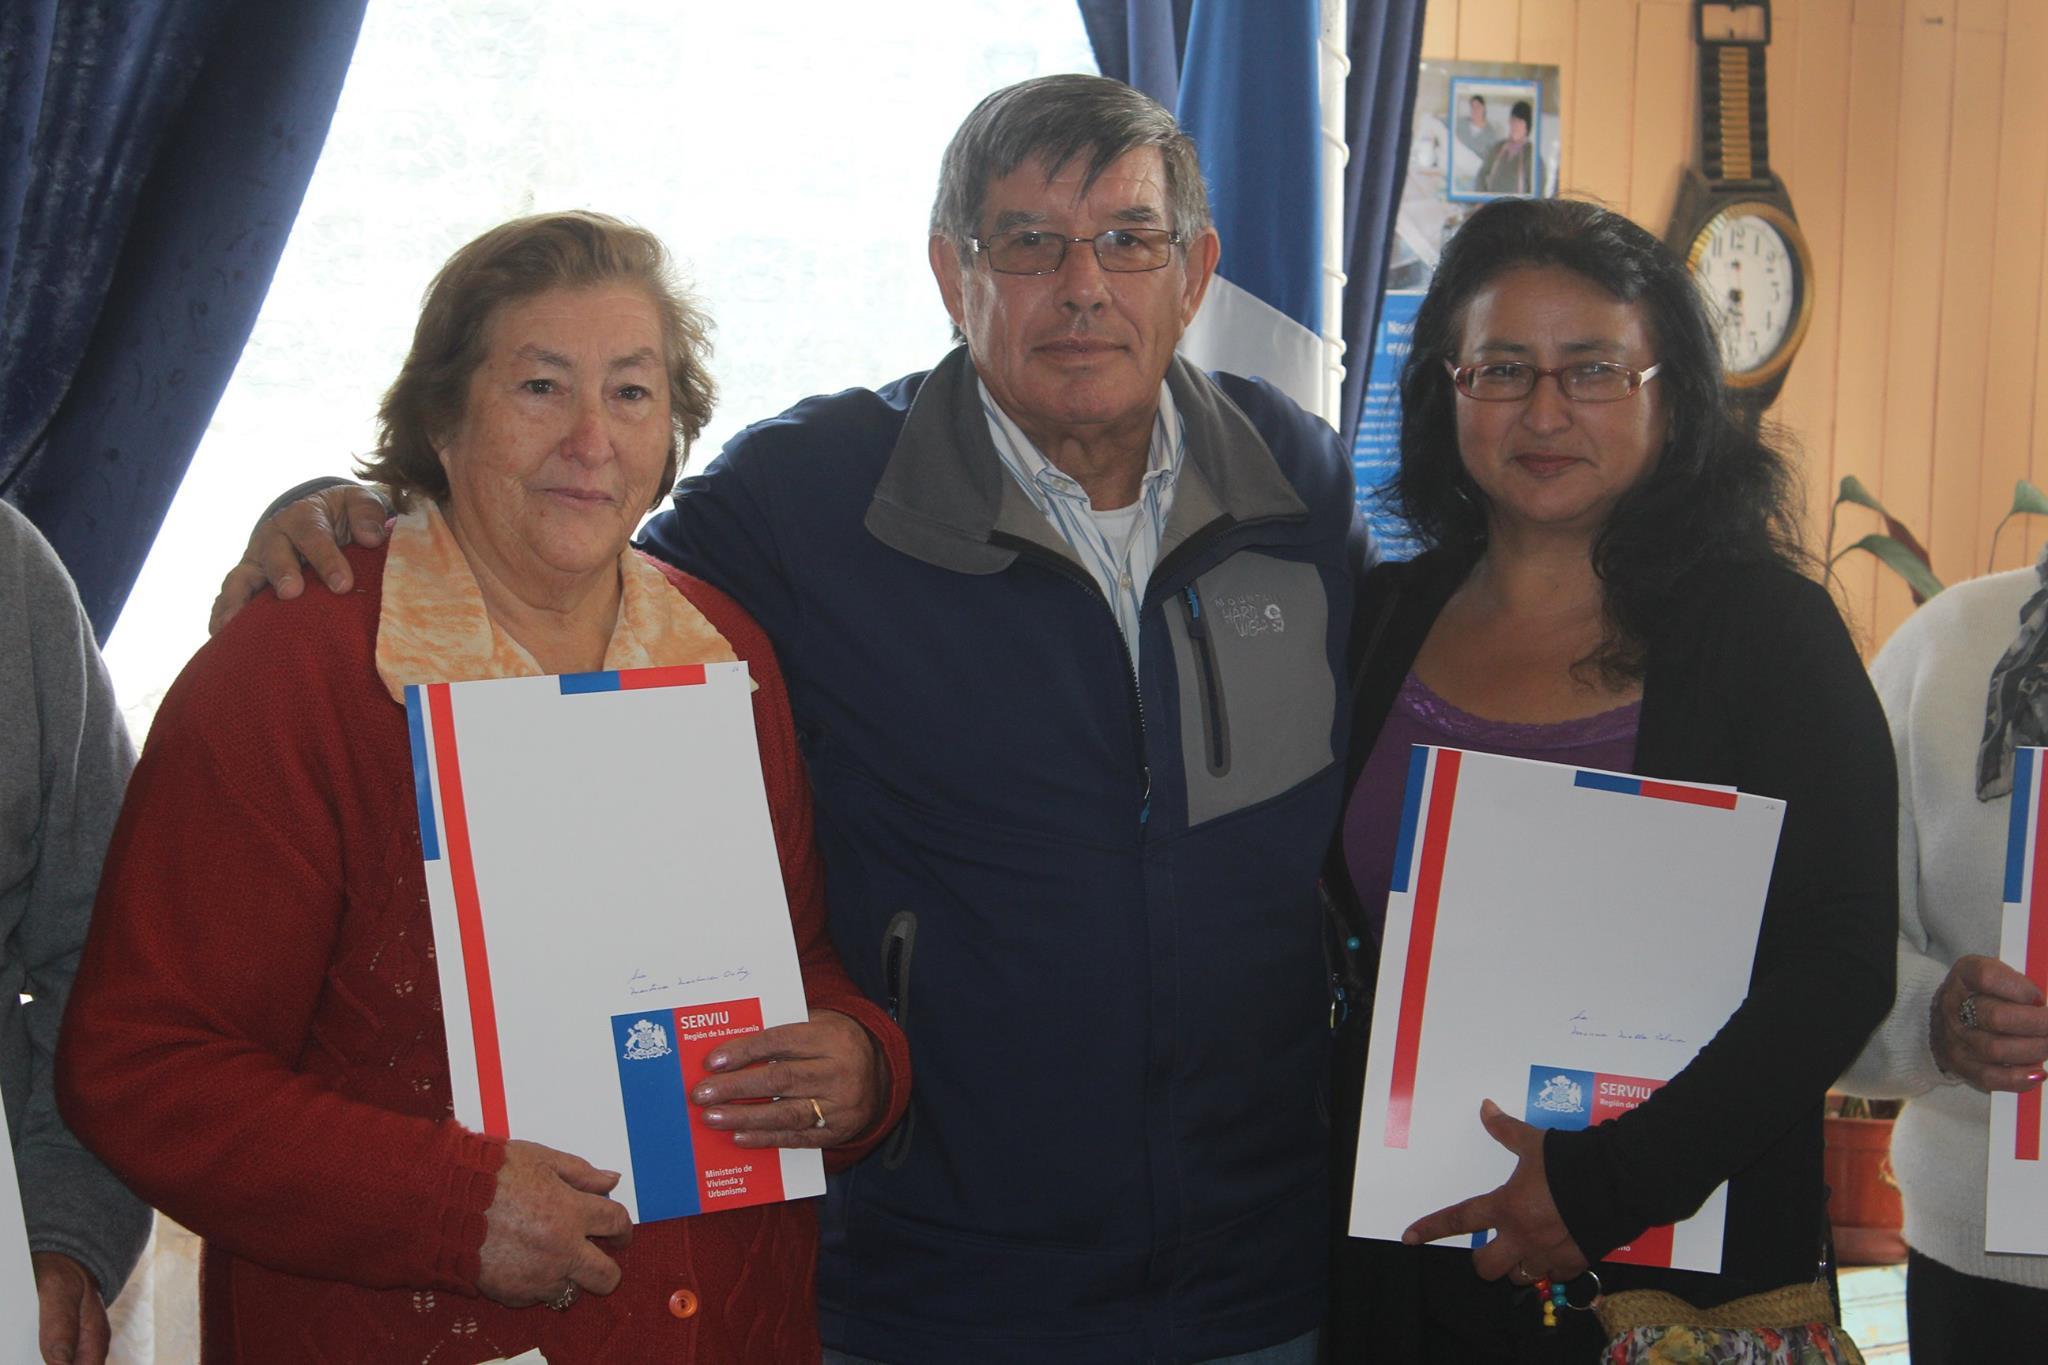 Múltiples muestras de pesar por el fallecimiento del alcalde de Toltén